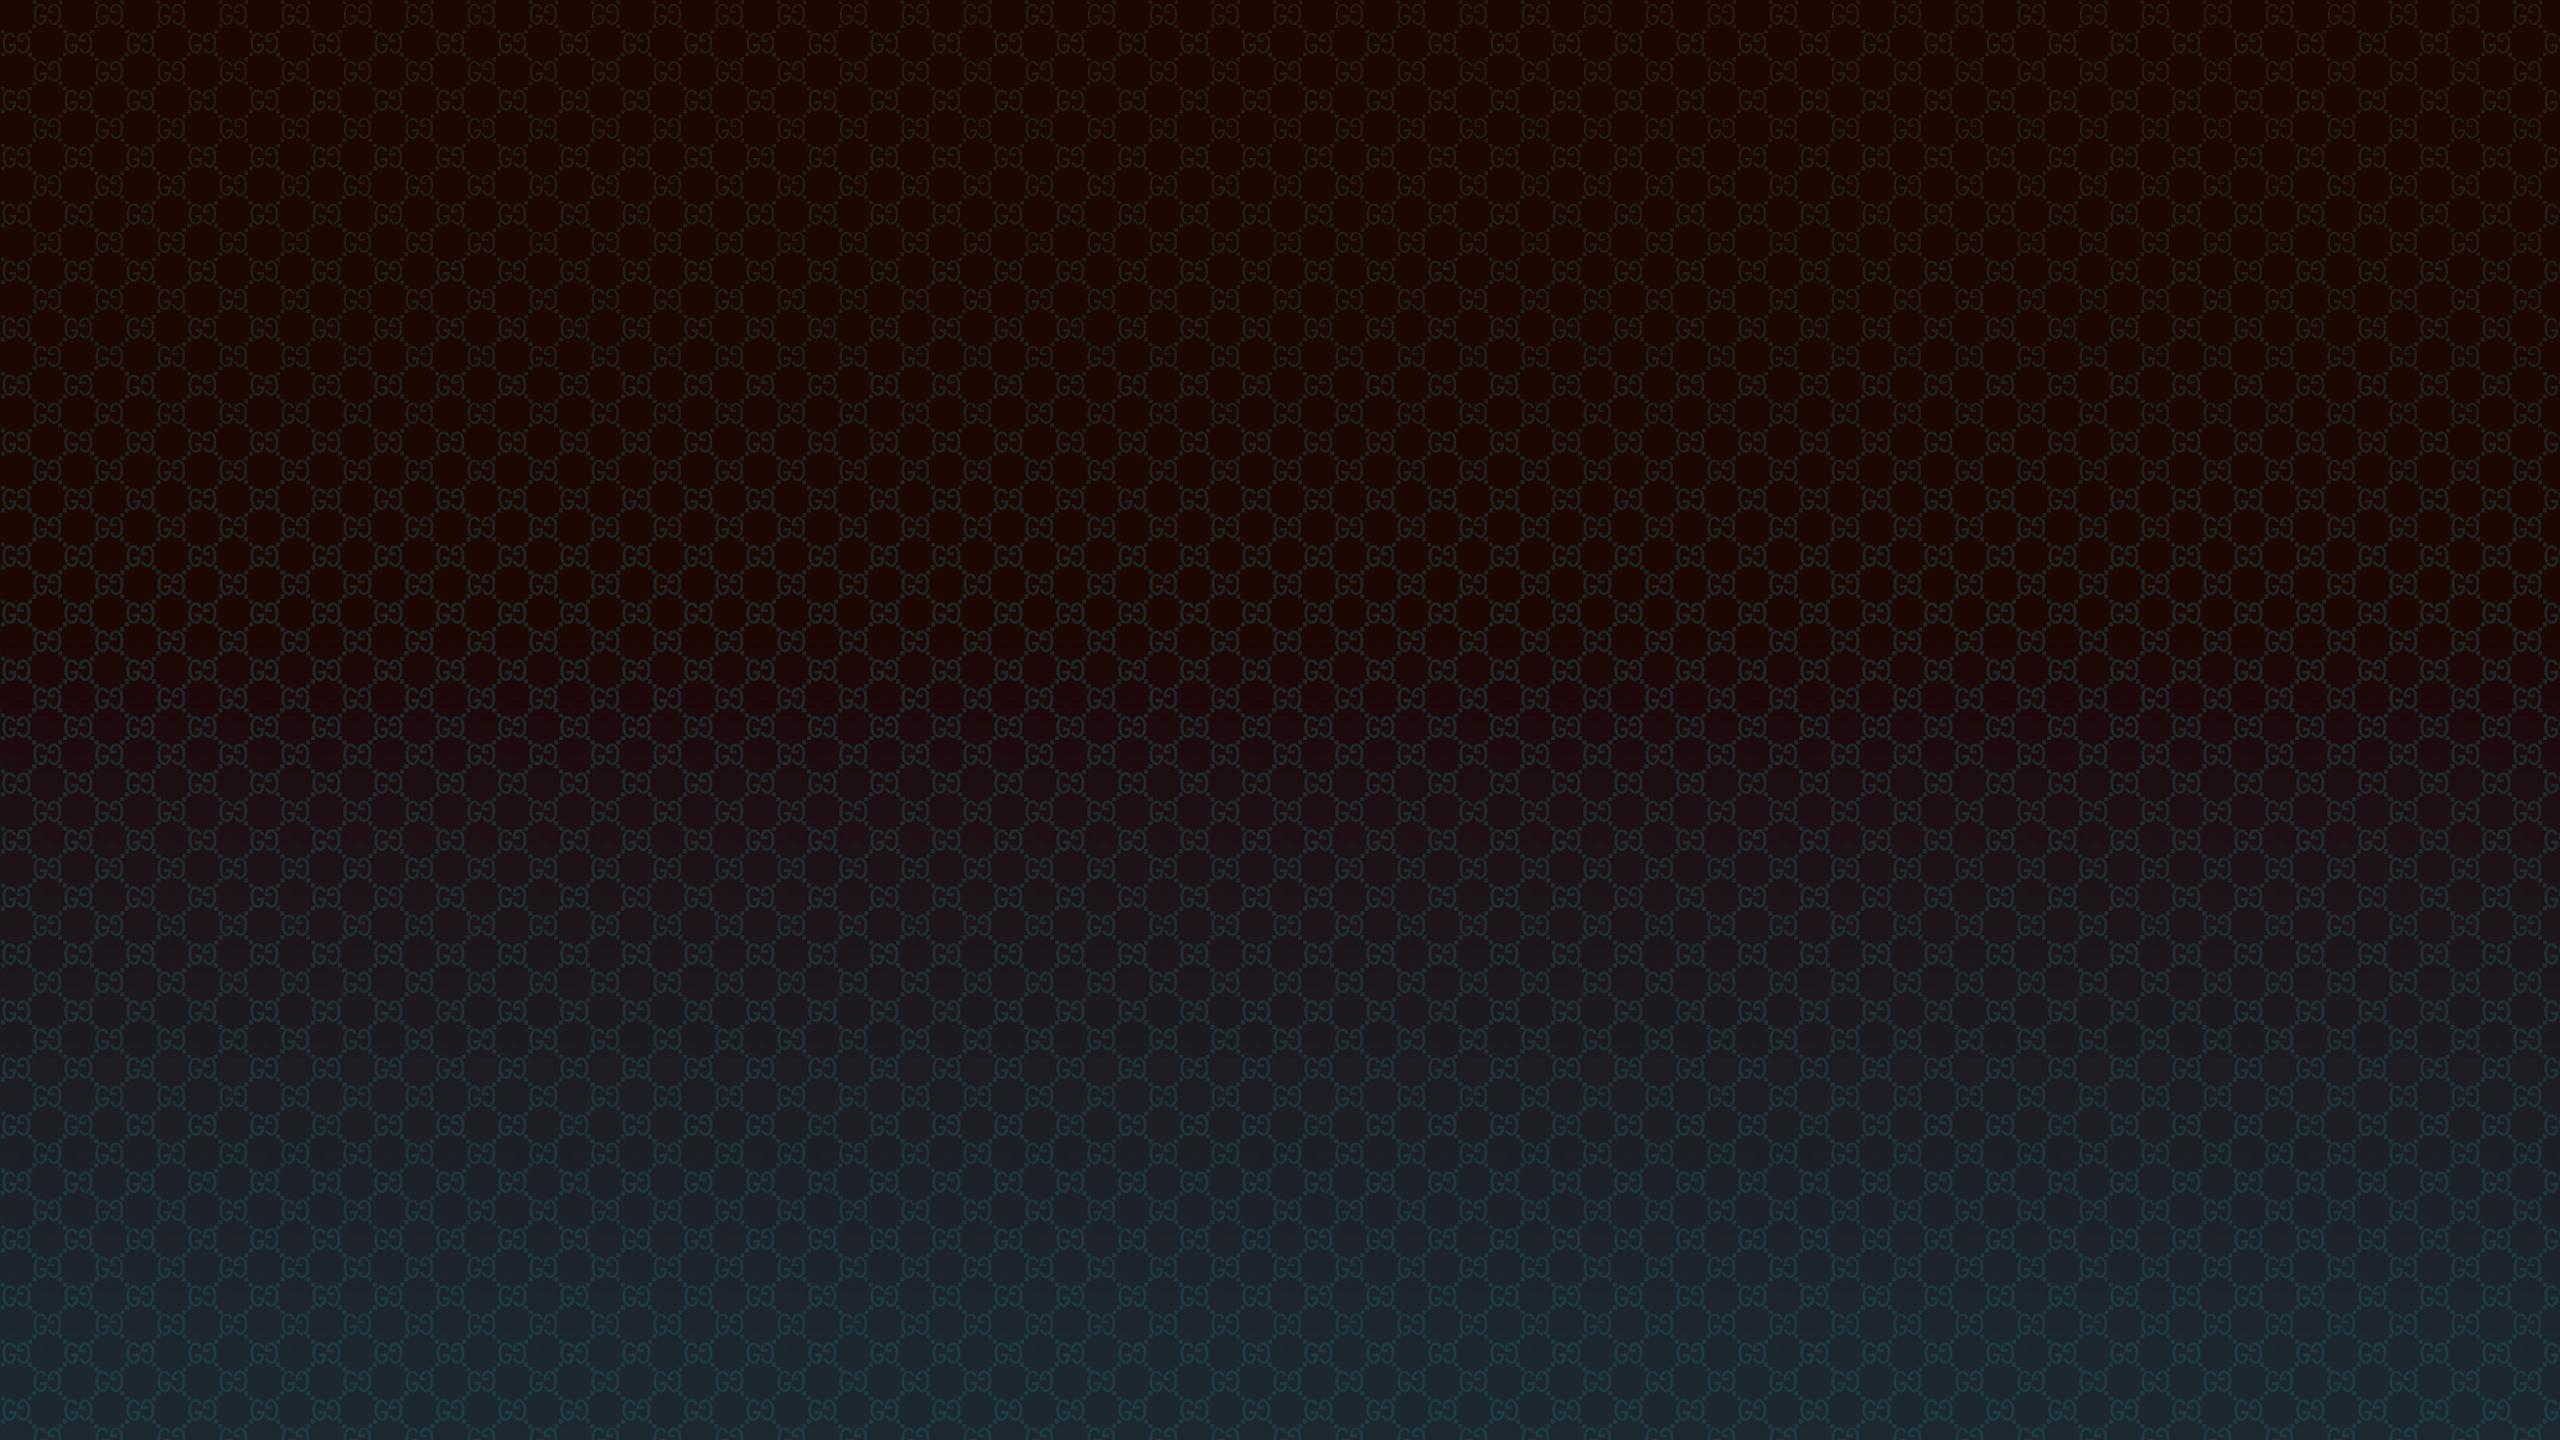 Gucci Wallpapers HD 2560x1440